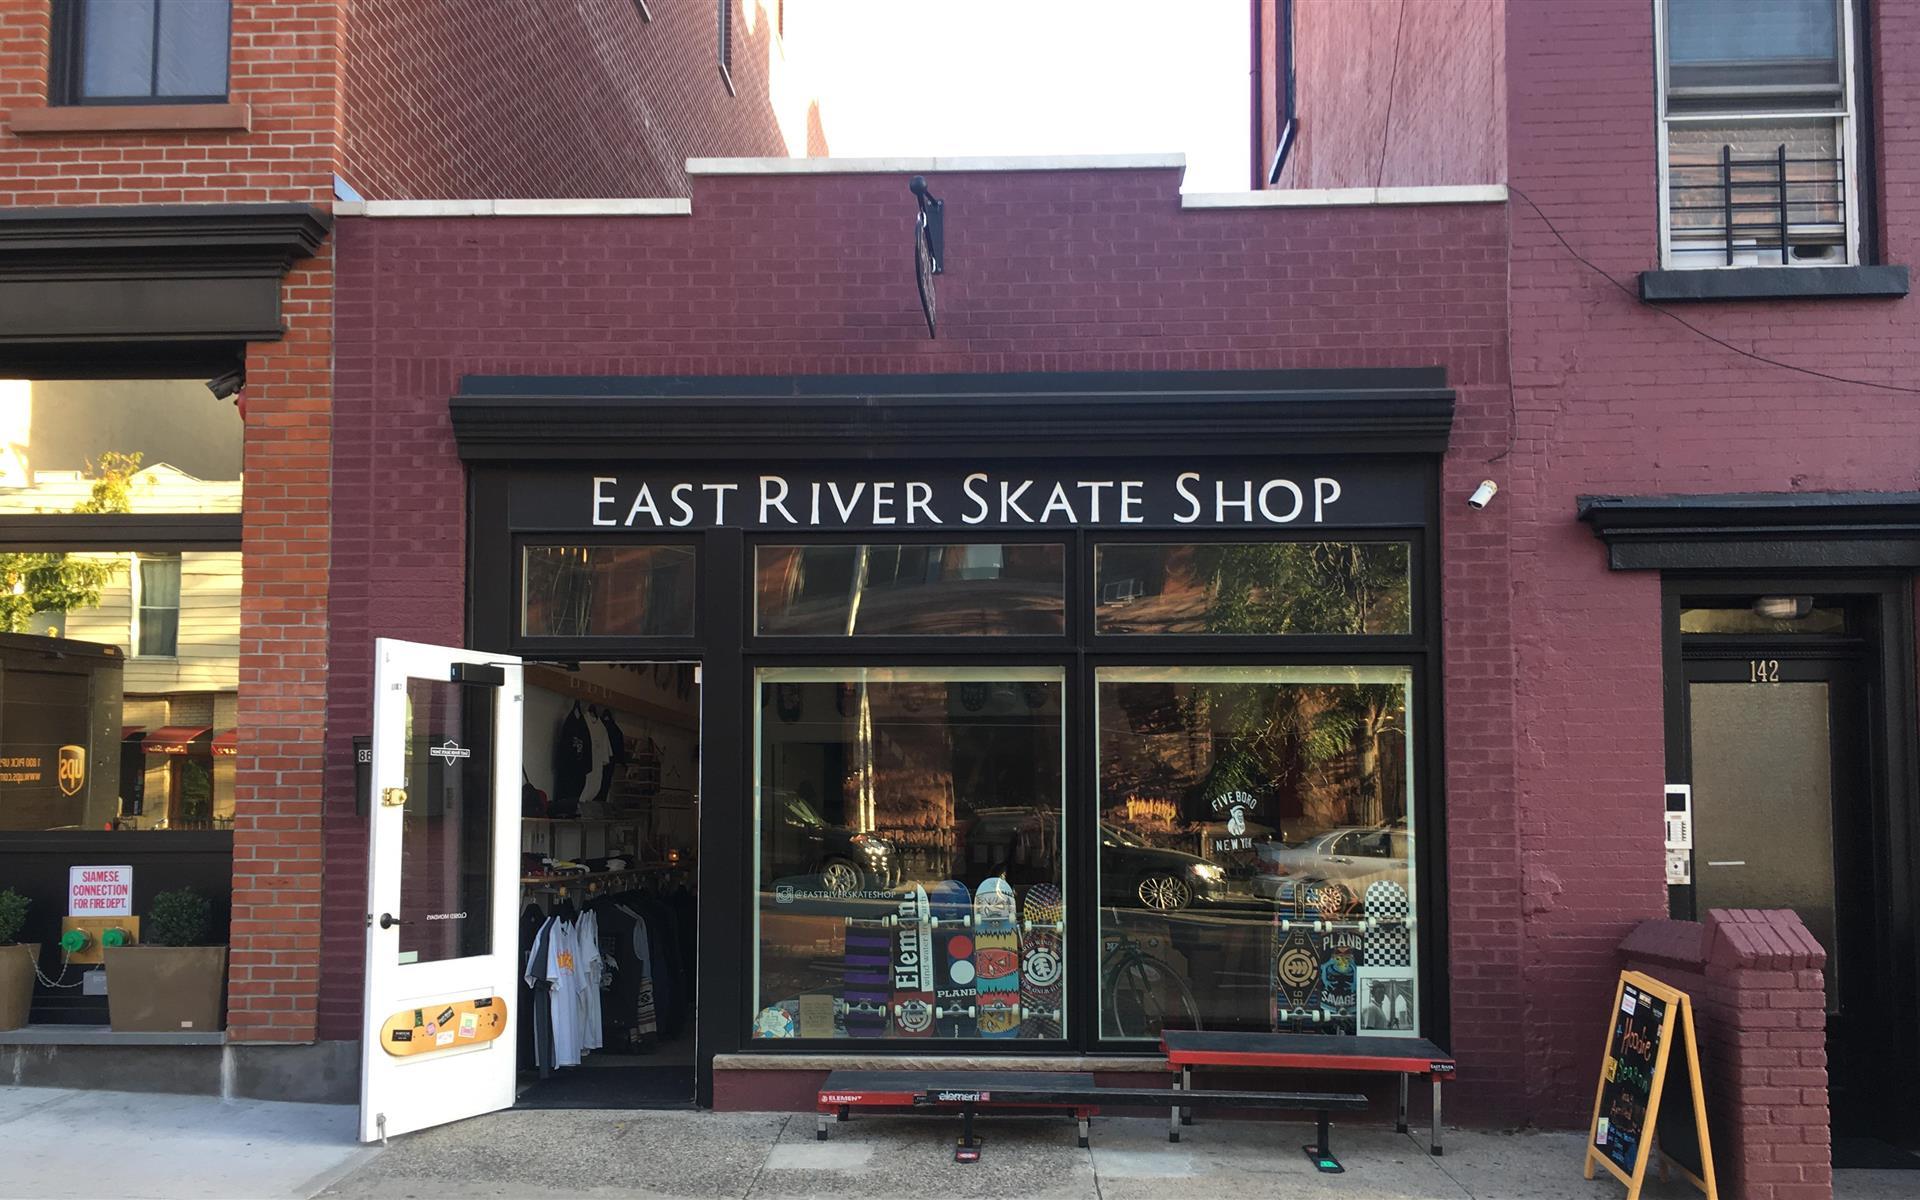 East River Skate Shop - East River Skate Shop